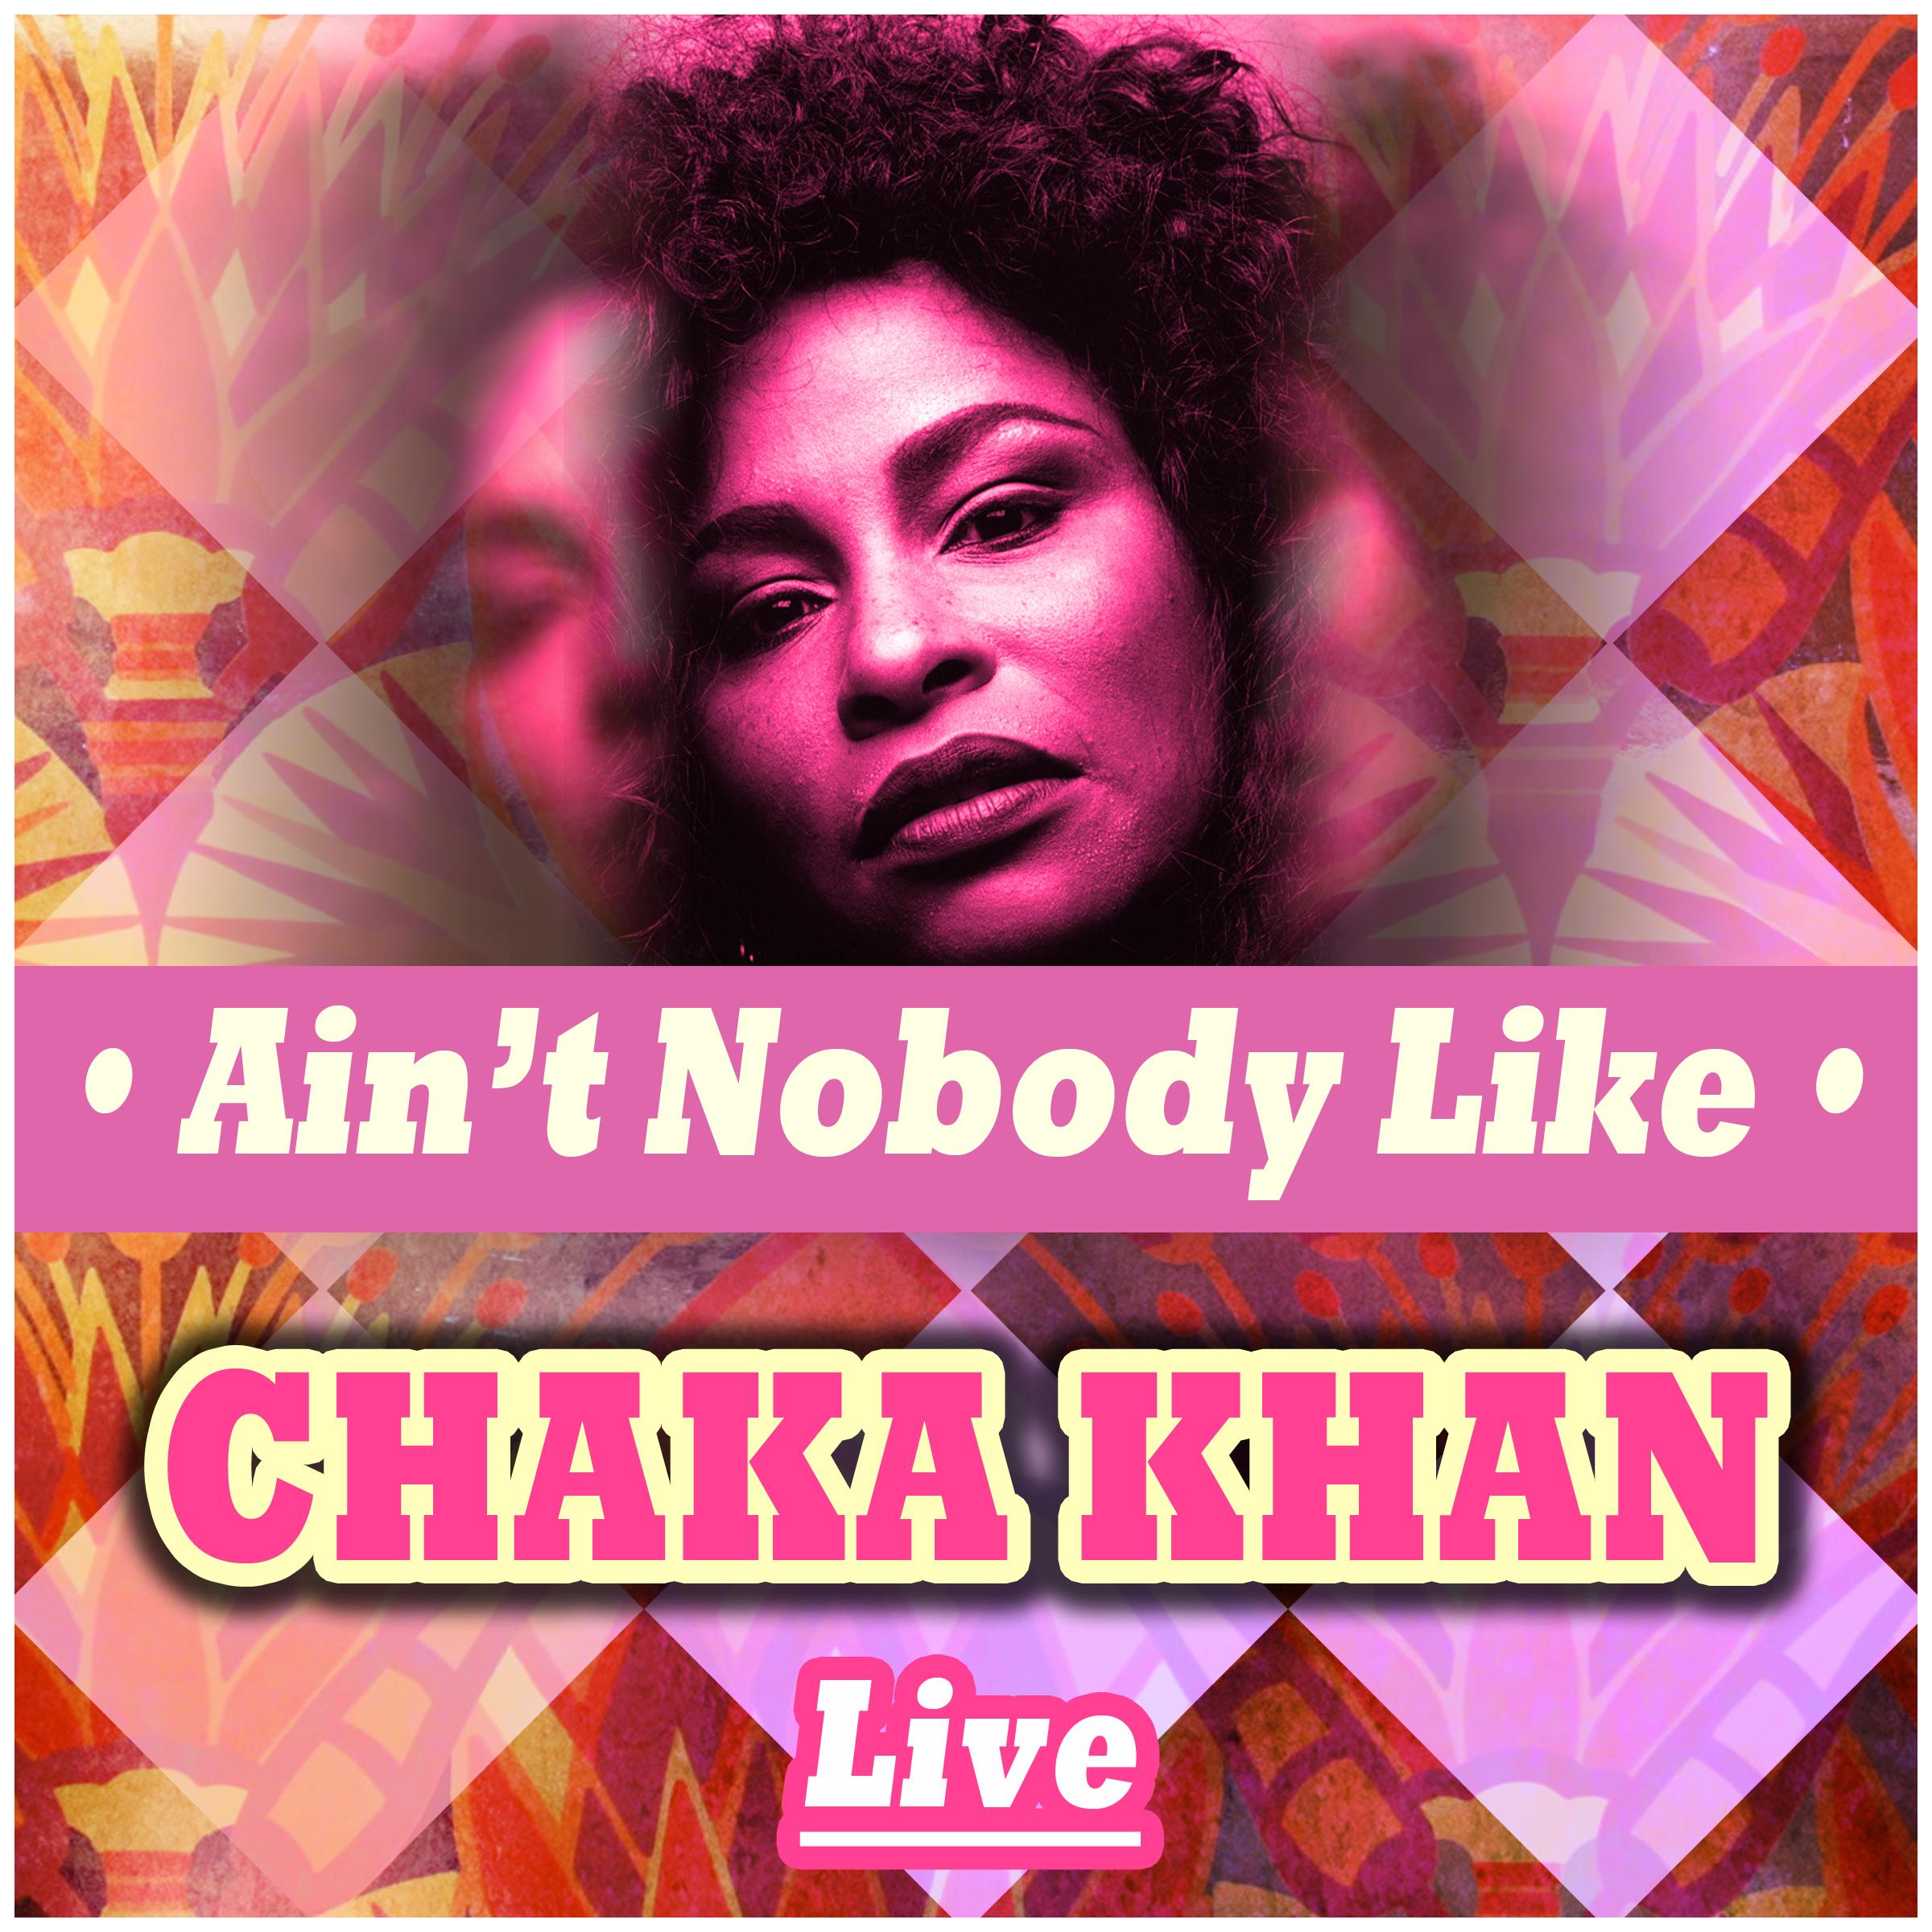 Ain't Nobody Like Chaka Khan Live – Chaka Khan